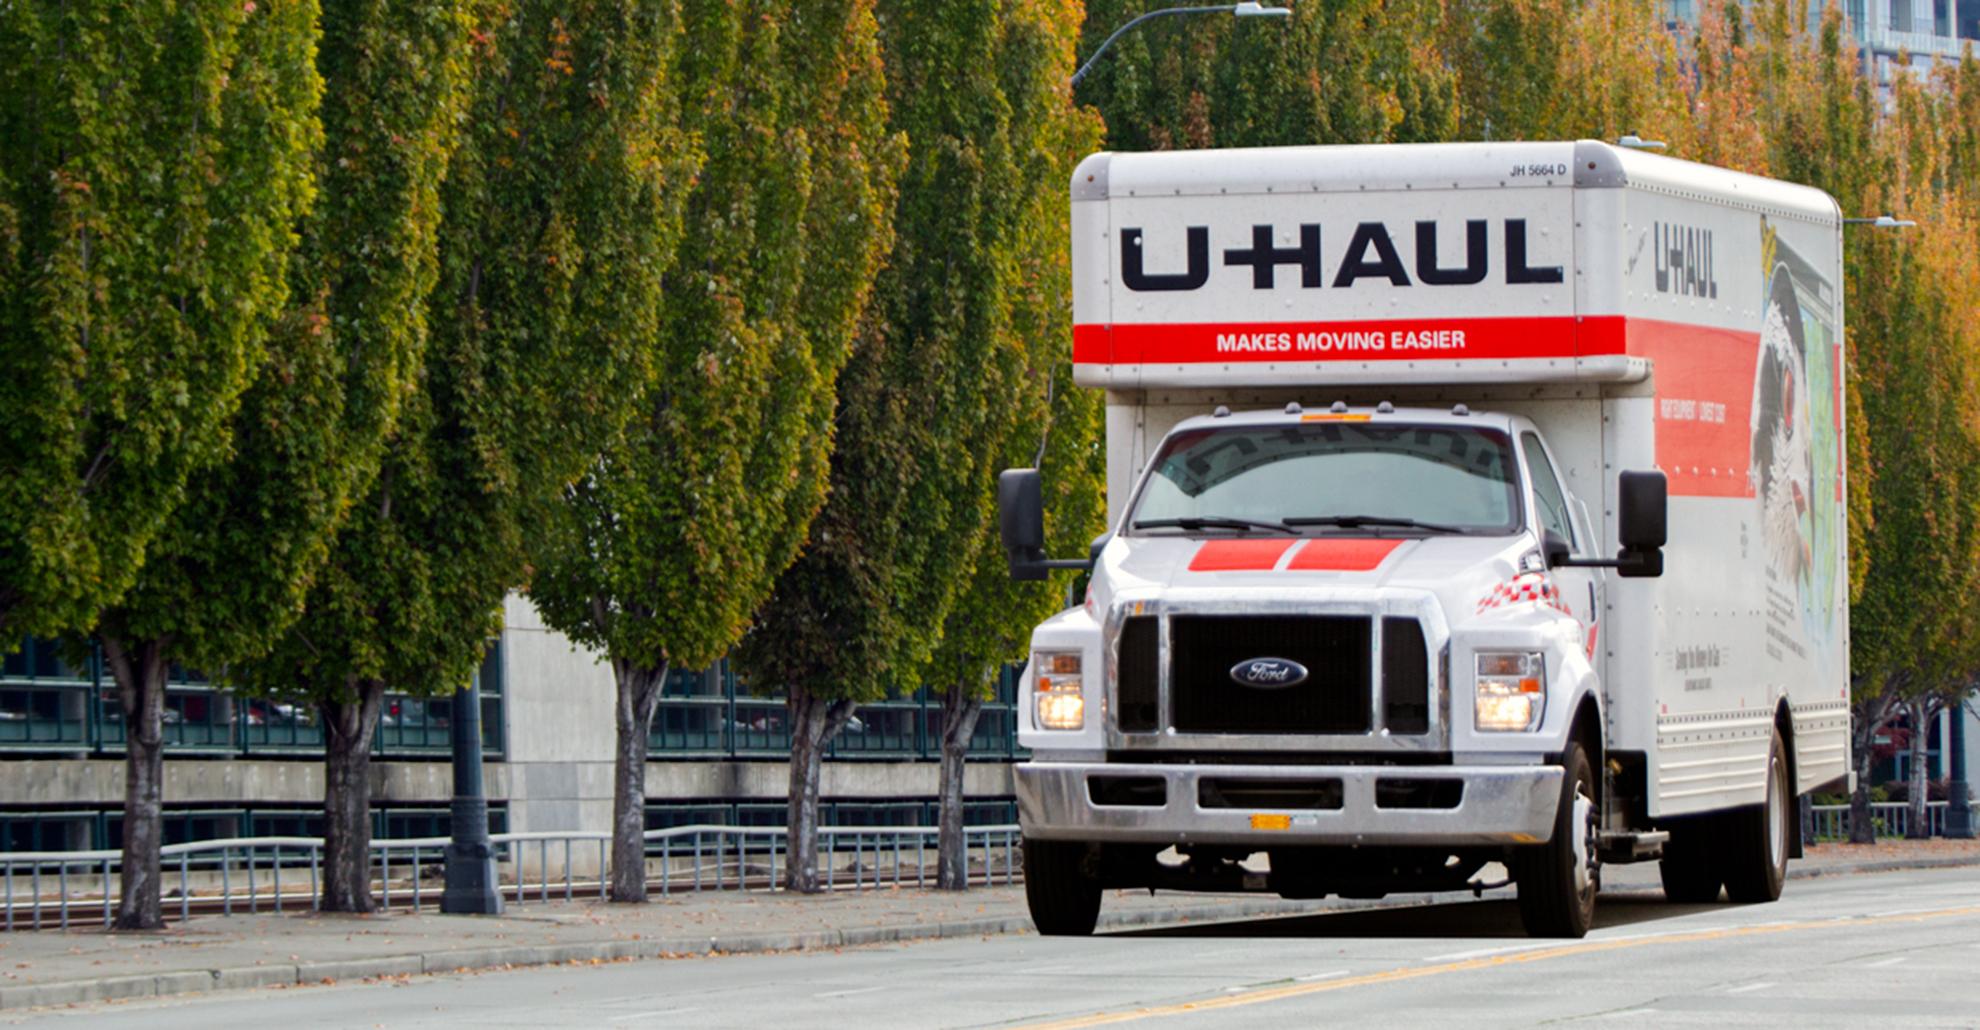 Uhaul Truck 2